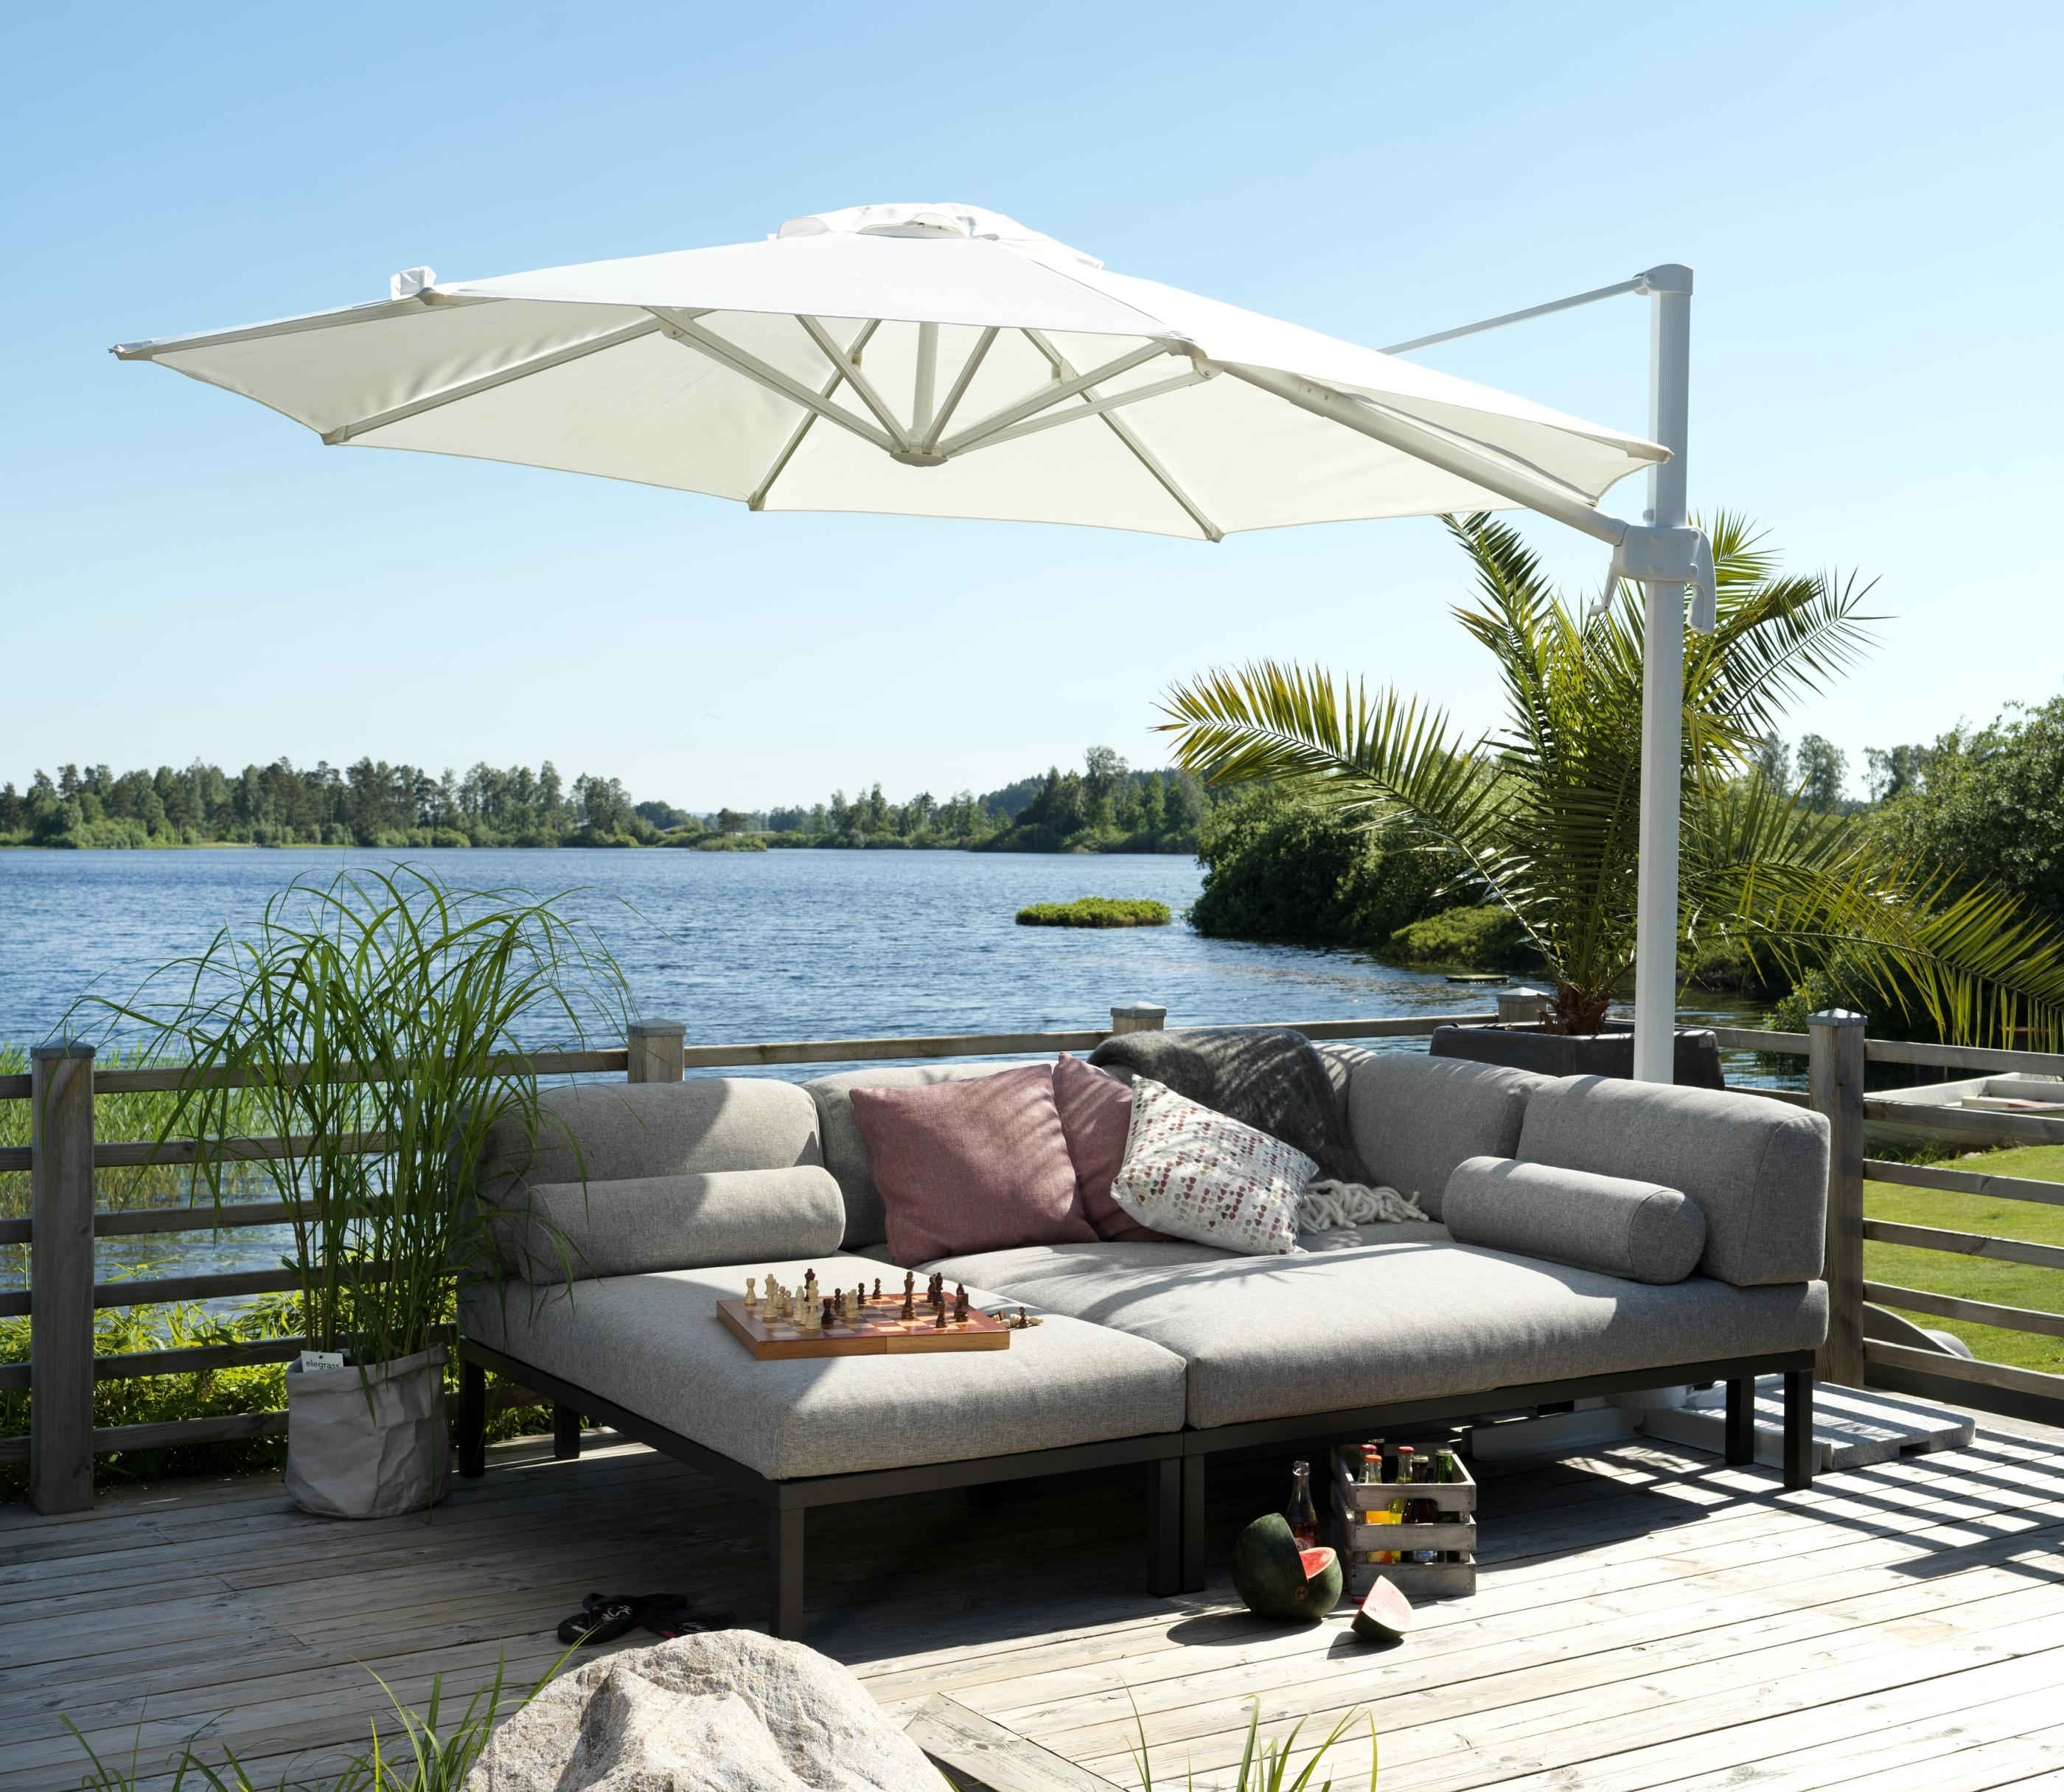 Strange Brafab Gartenmobel Brafab Outdoor Mobel Online Kaufen Cjindustries Chair Design For Home Cjindustriesco